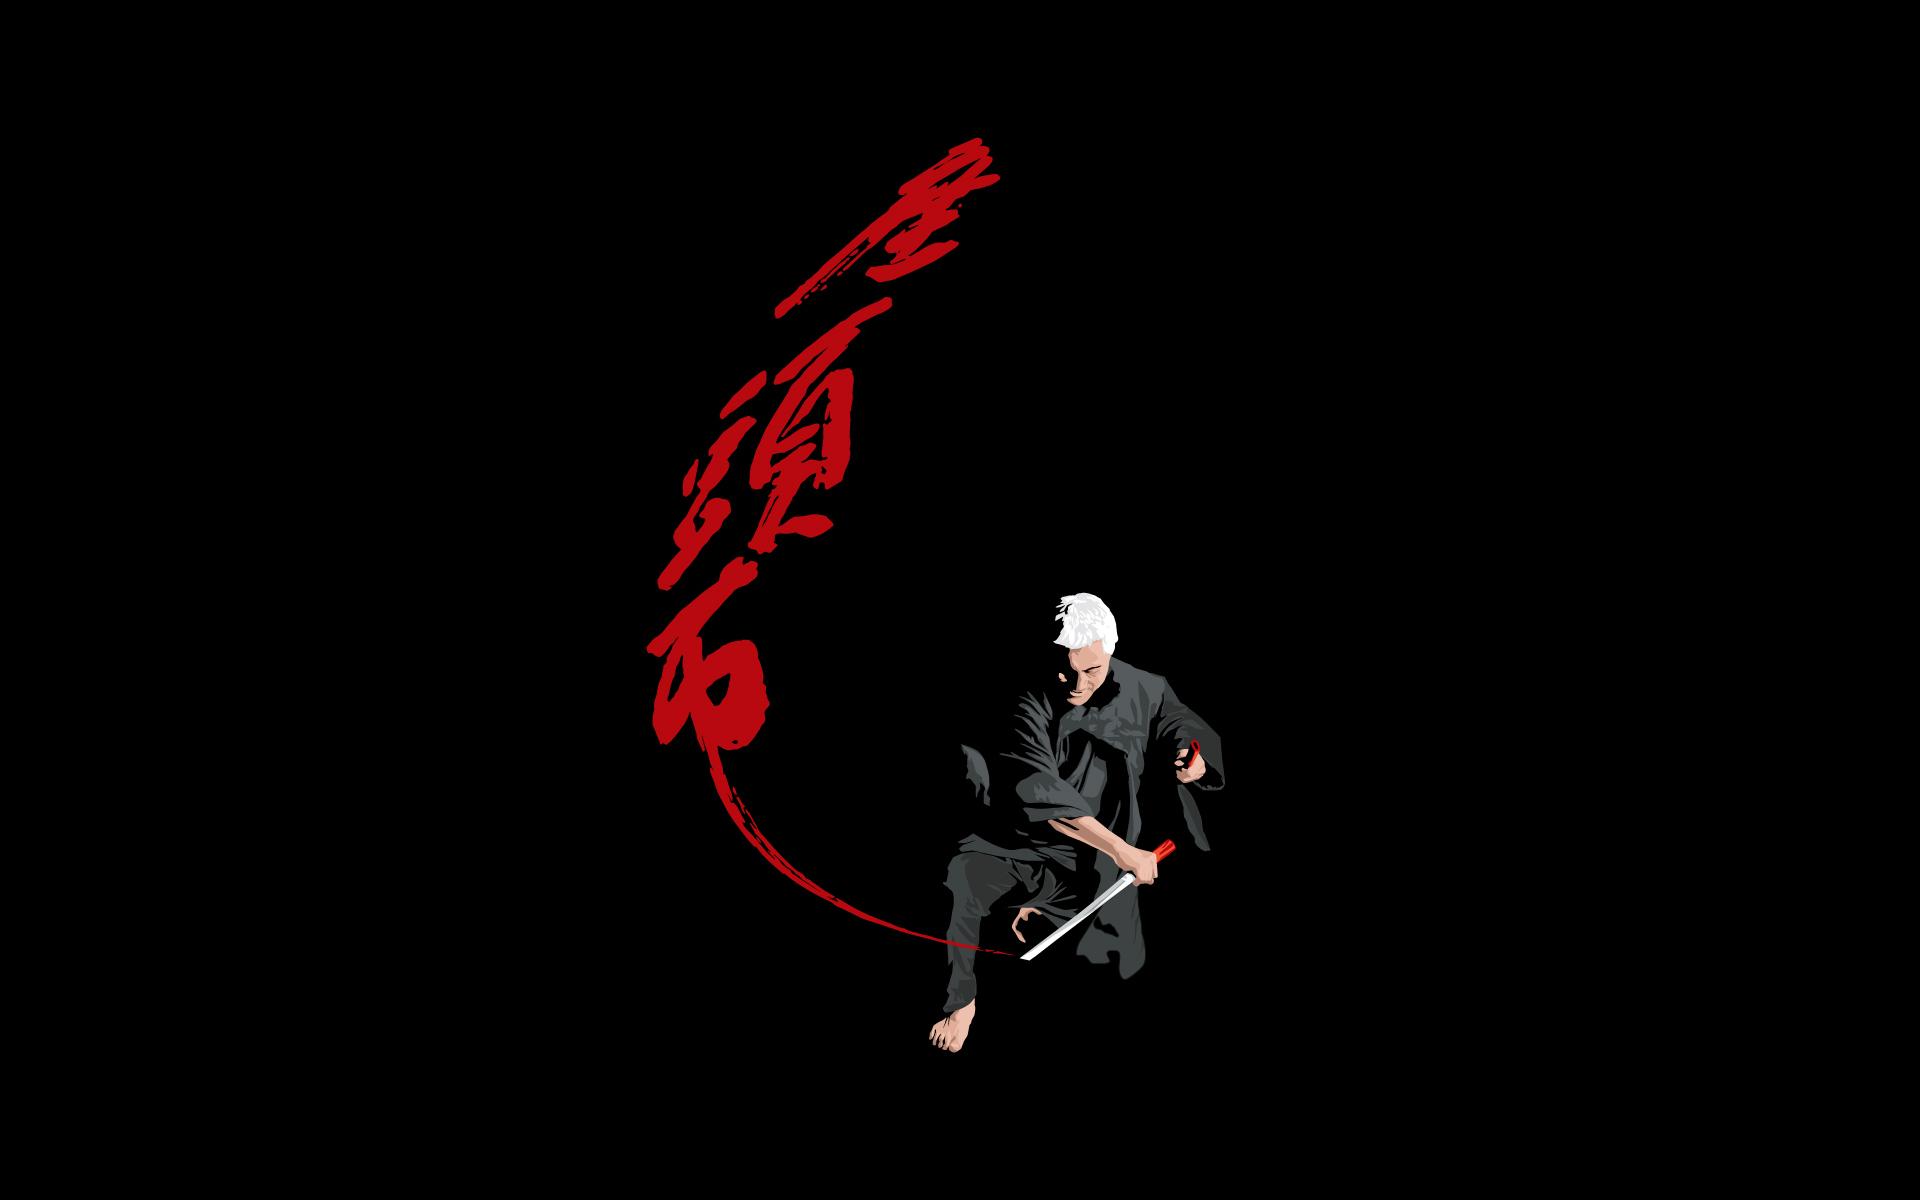 Drawn samurai desktop background Art Wallpaper wallarthd Wallpaper Sword